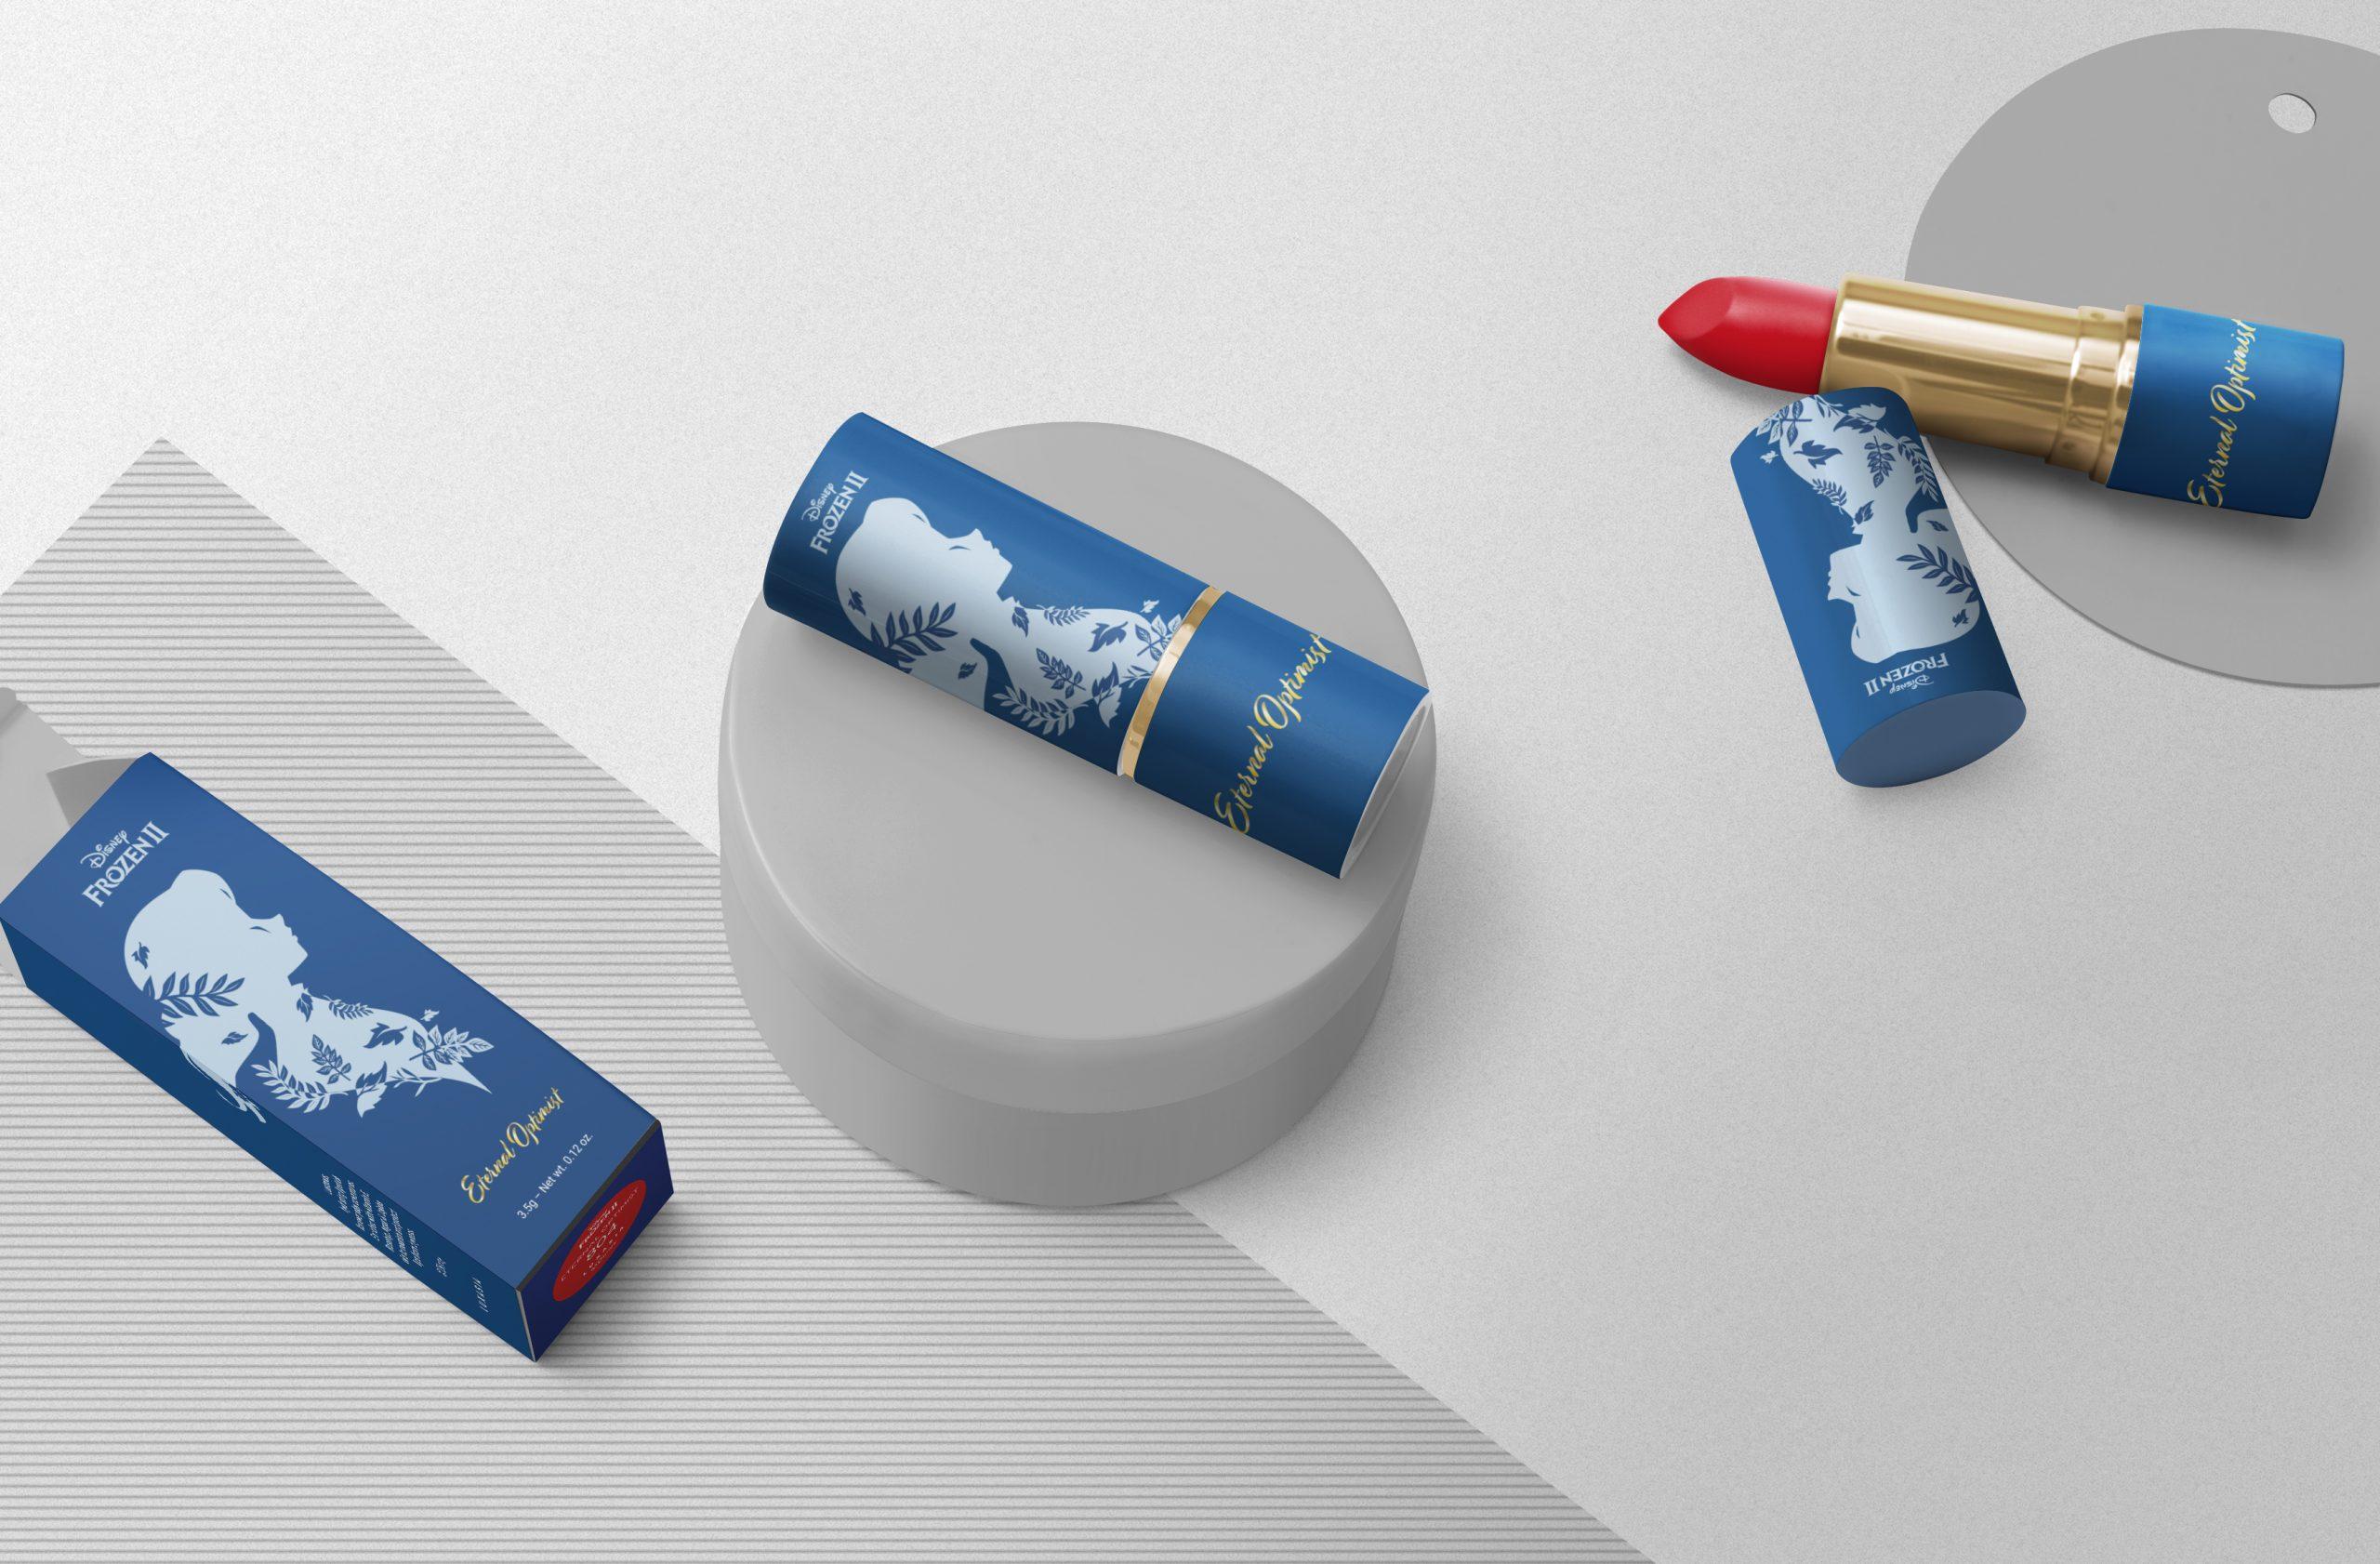 Disney Frozen lipstick | NOKUA Design | MUSE Design Awards